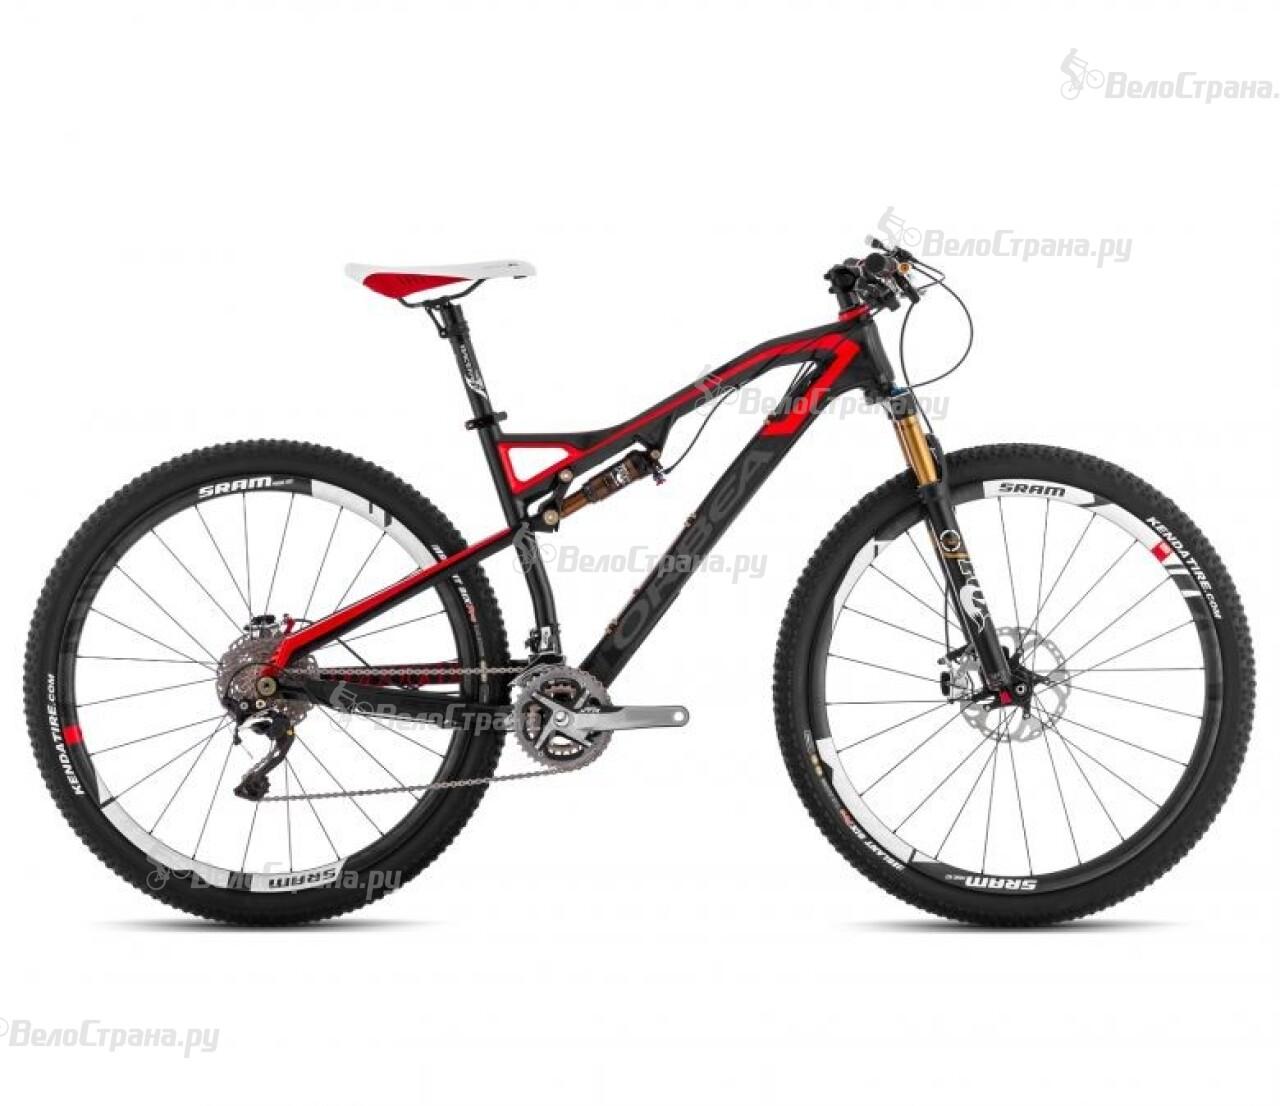 Велосипед Orbea Occam 29 M10 (2014)